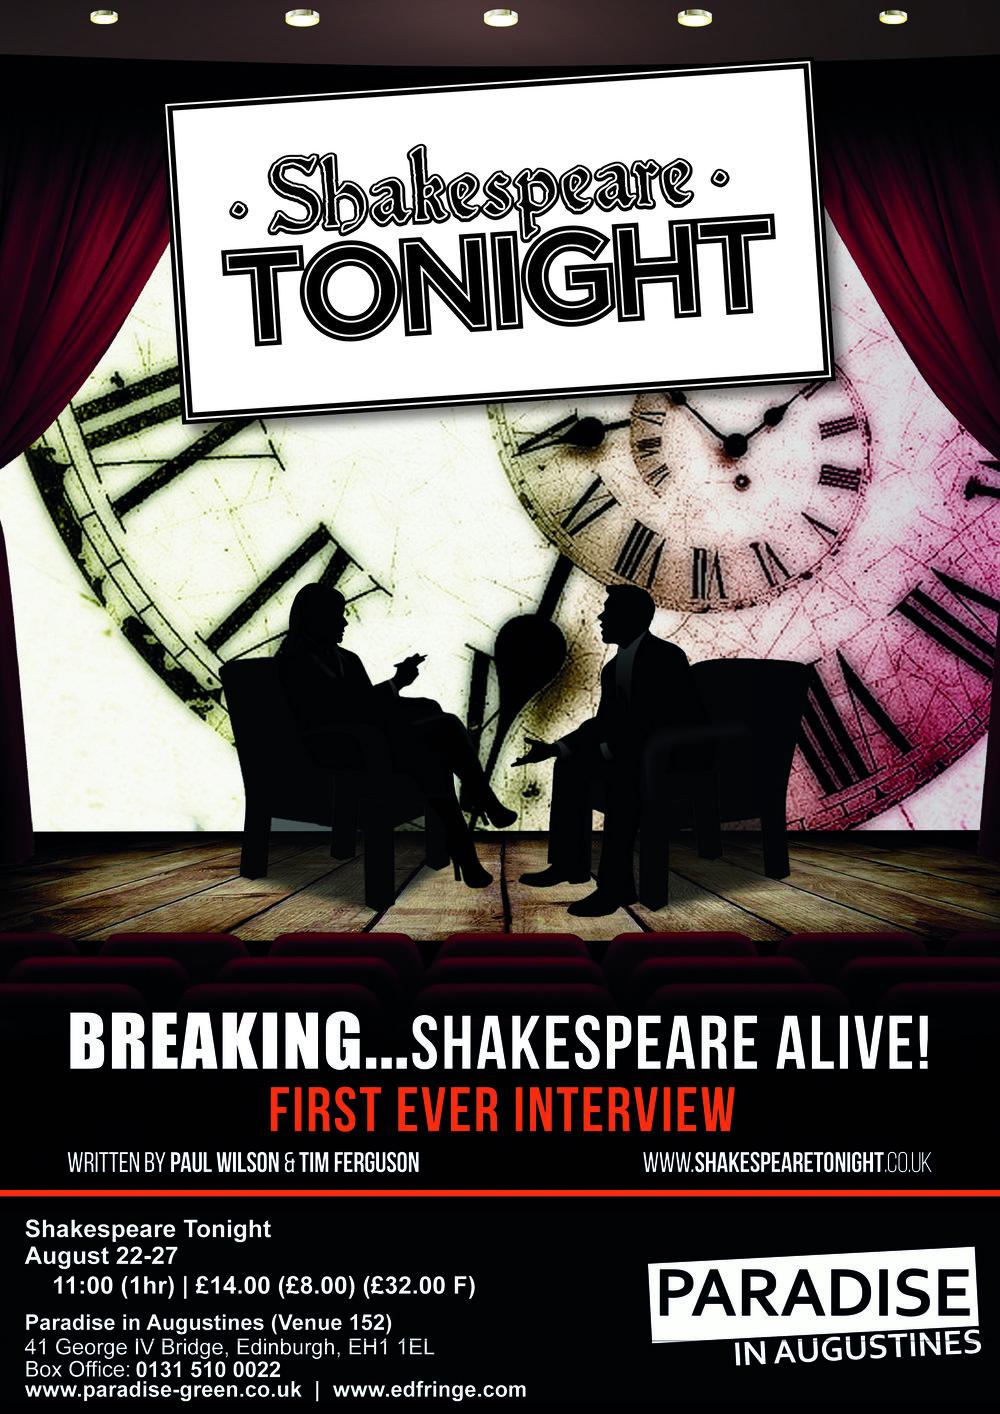 Shakesperare Tonight Poster-Edinburgh.jpg